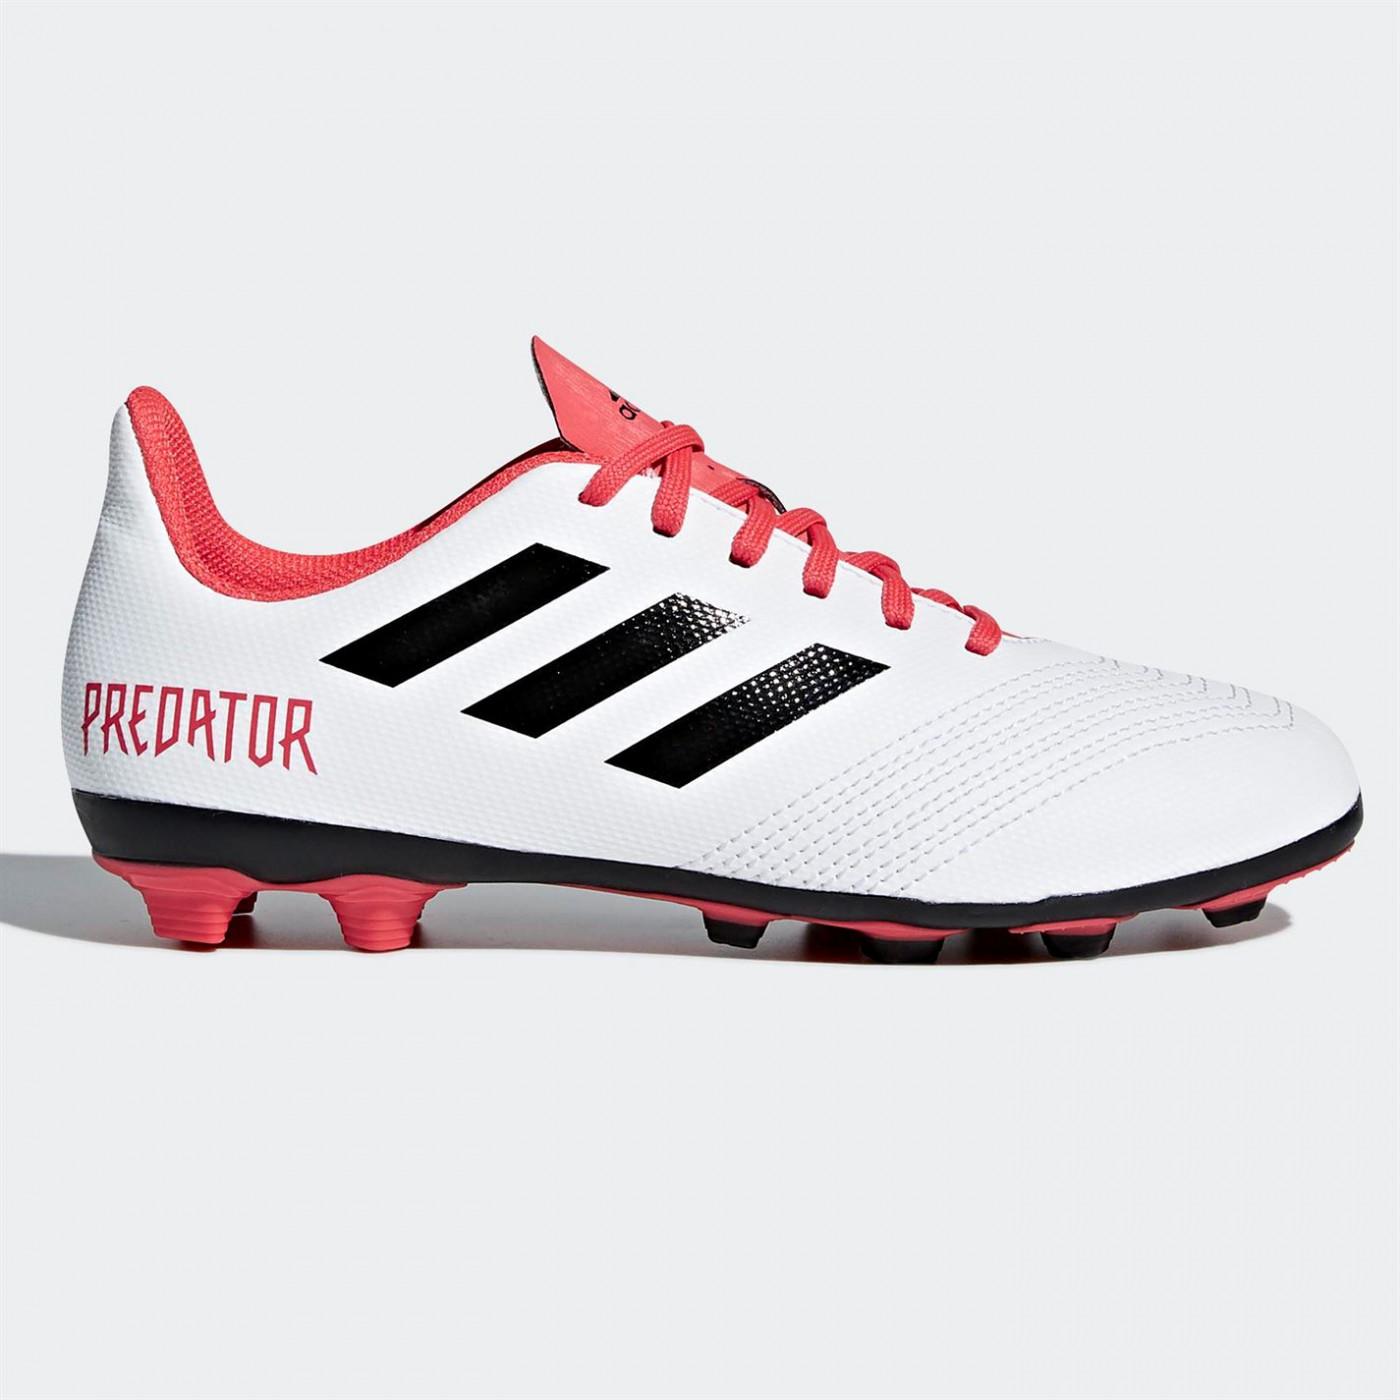 2b6c51fcfb68 Adidas Predator 18.4 Junior FG Football Boots - FACTCOOL